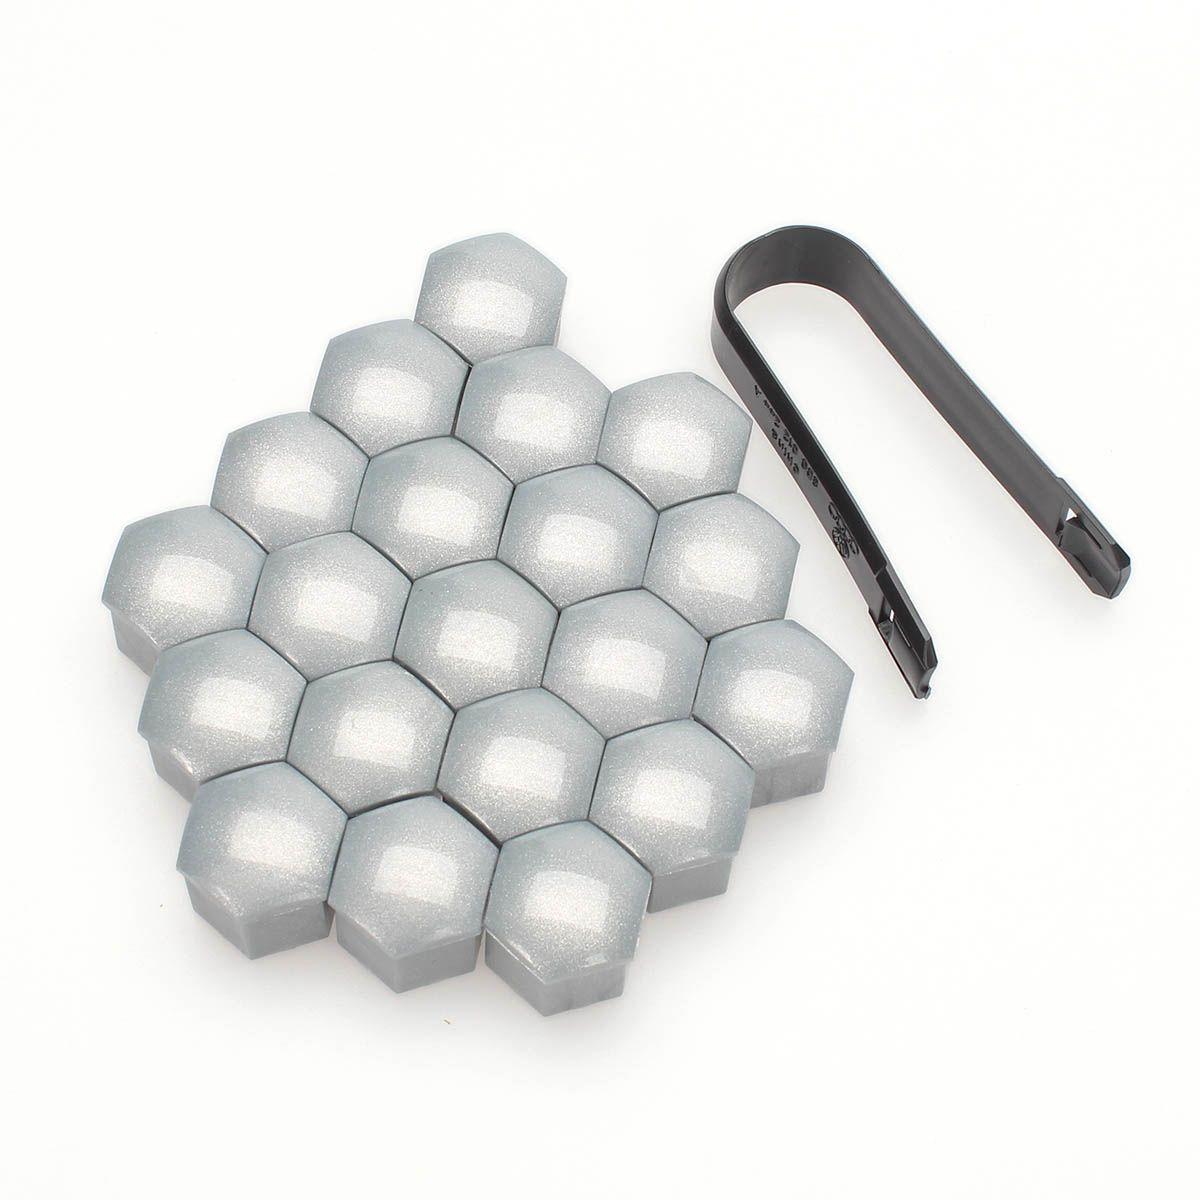 Original 20pcs Wheel Lug Silver Nut Bolt Cover Caps Removal Tools for Skoda Audi VW Golf Passat 17mm